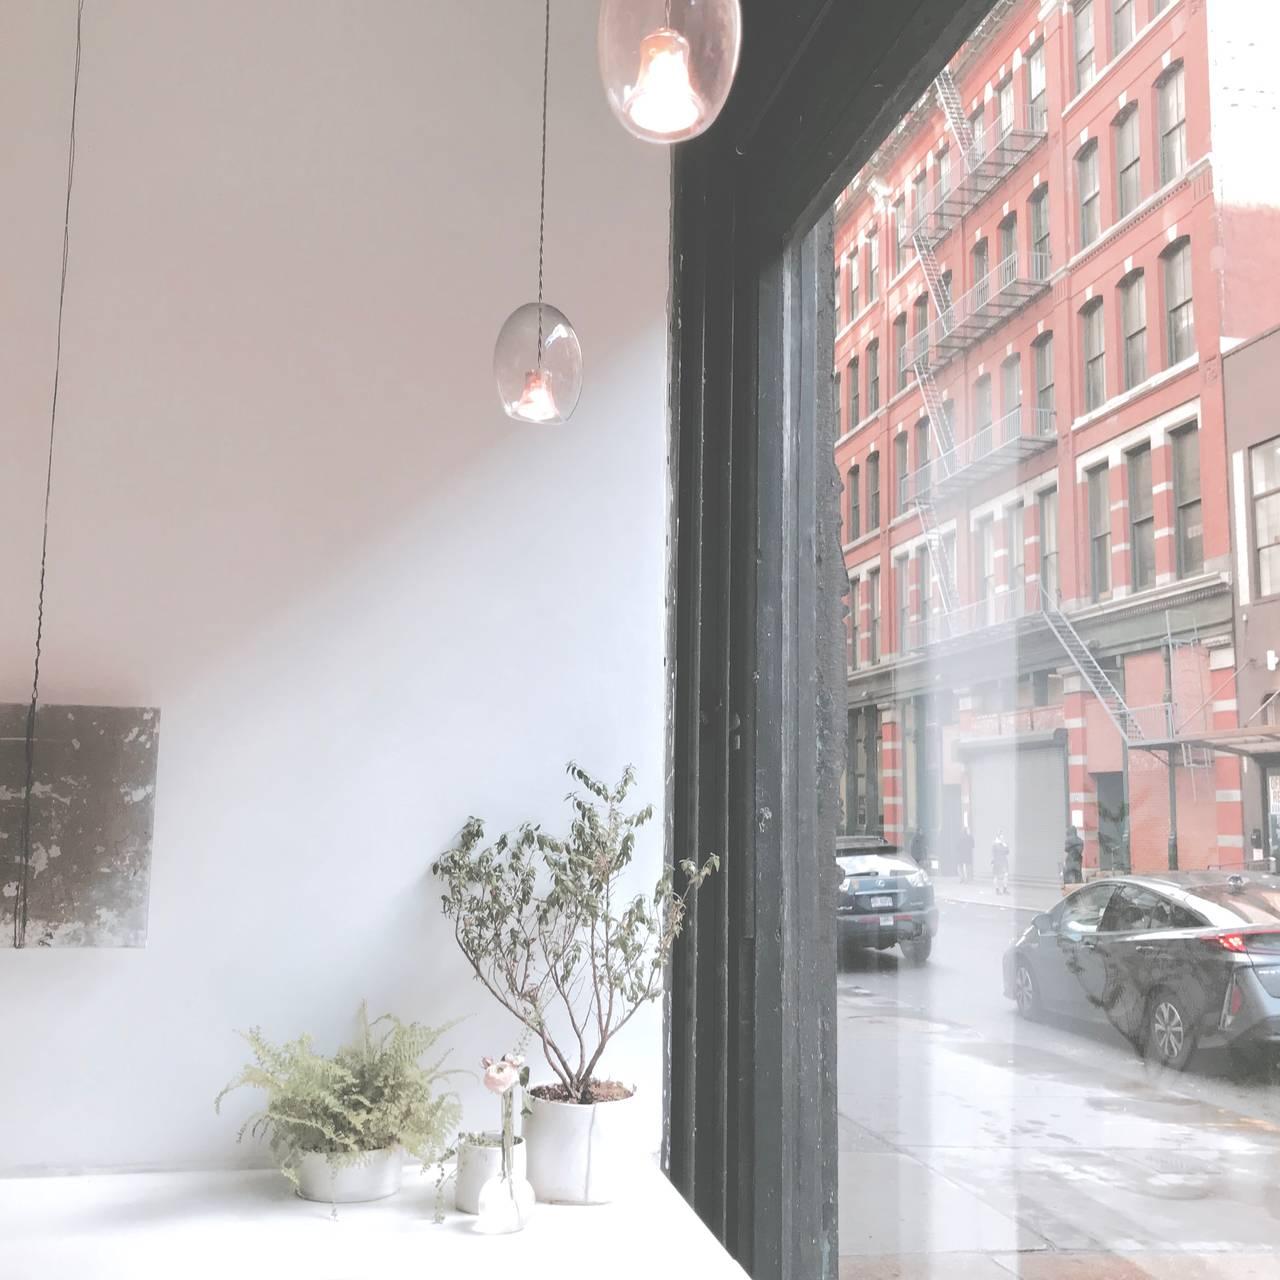 abc kitchen nynew york opentable